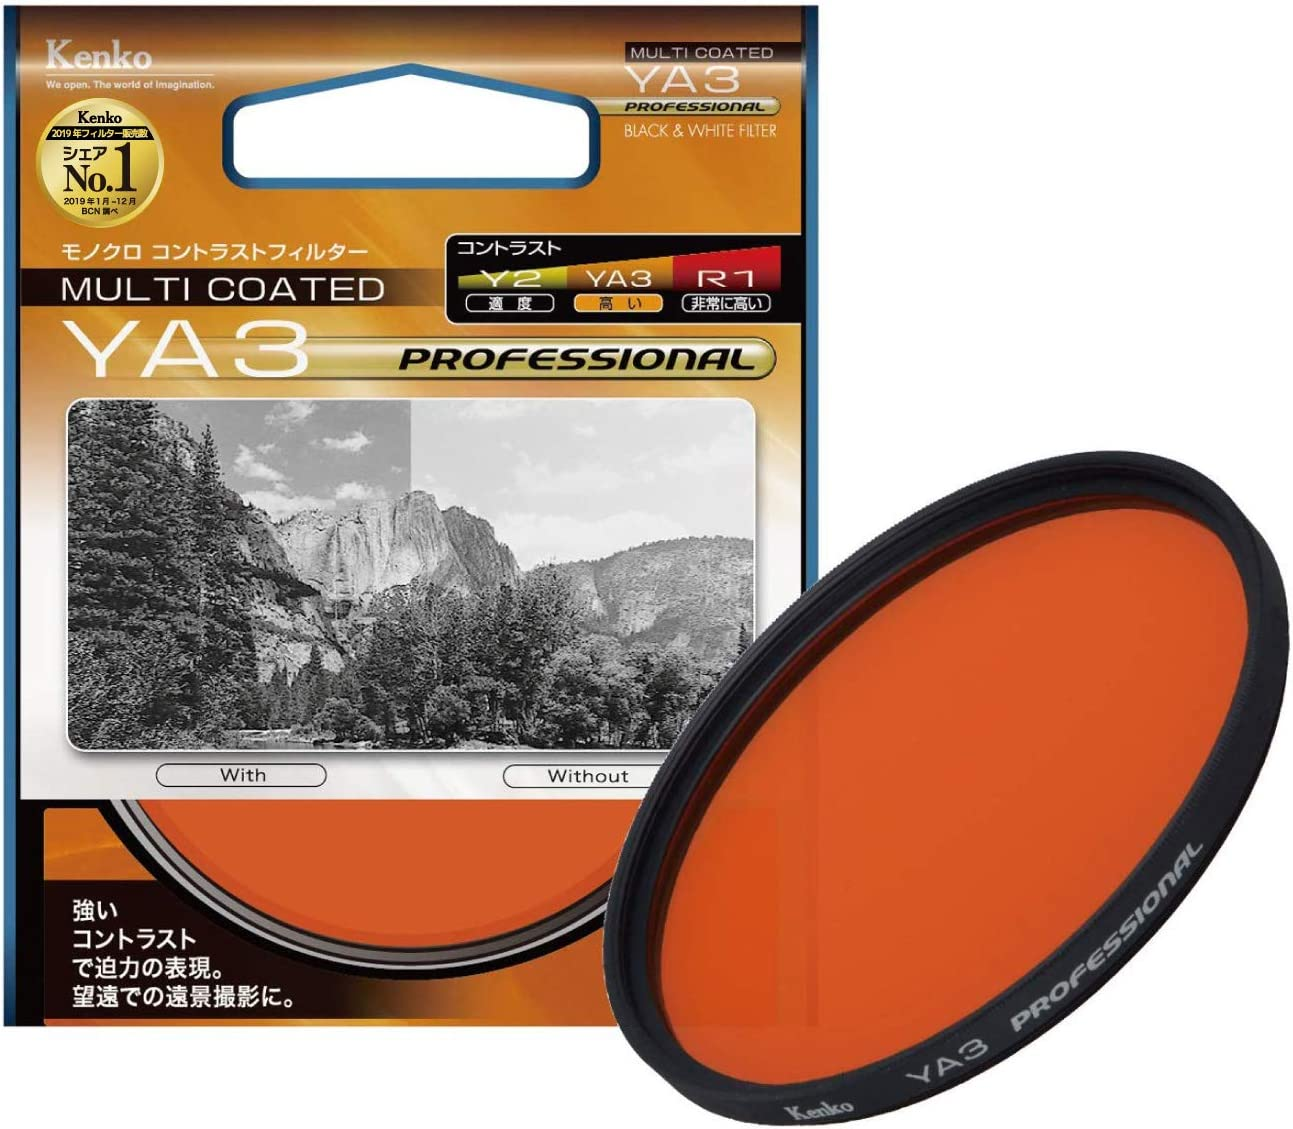 Kenko 55mm Y2 Professional Multi-Coated Camera Lens Filters